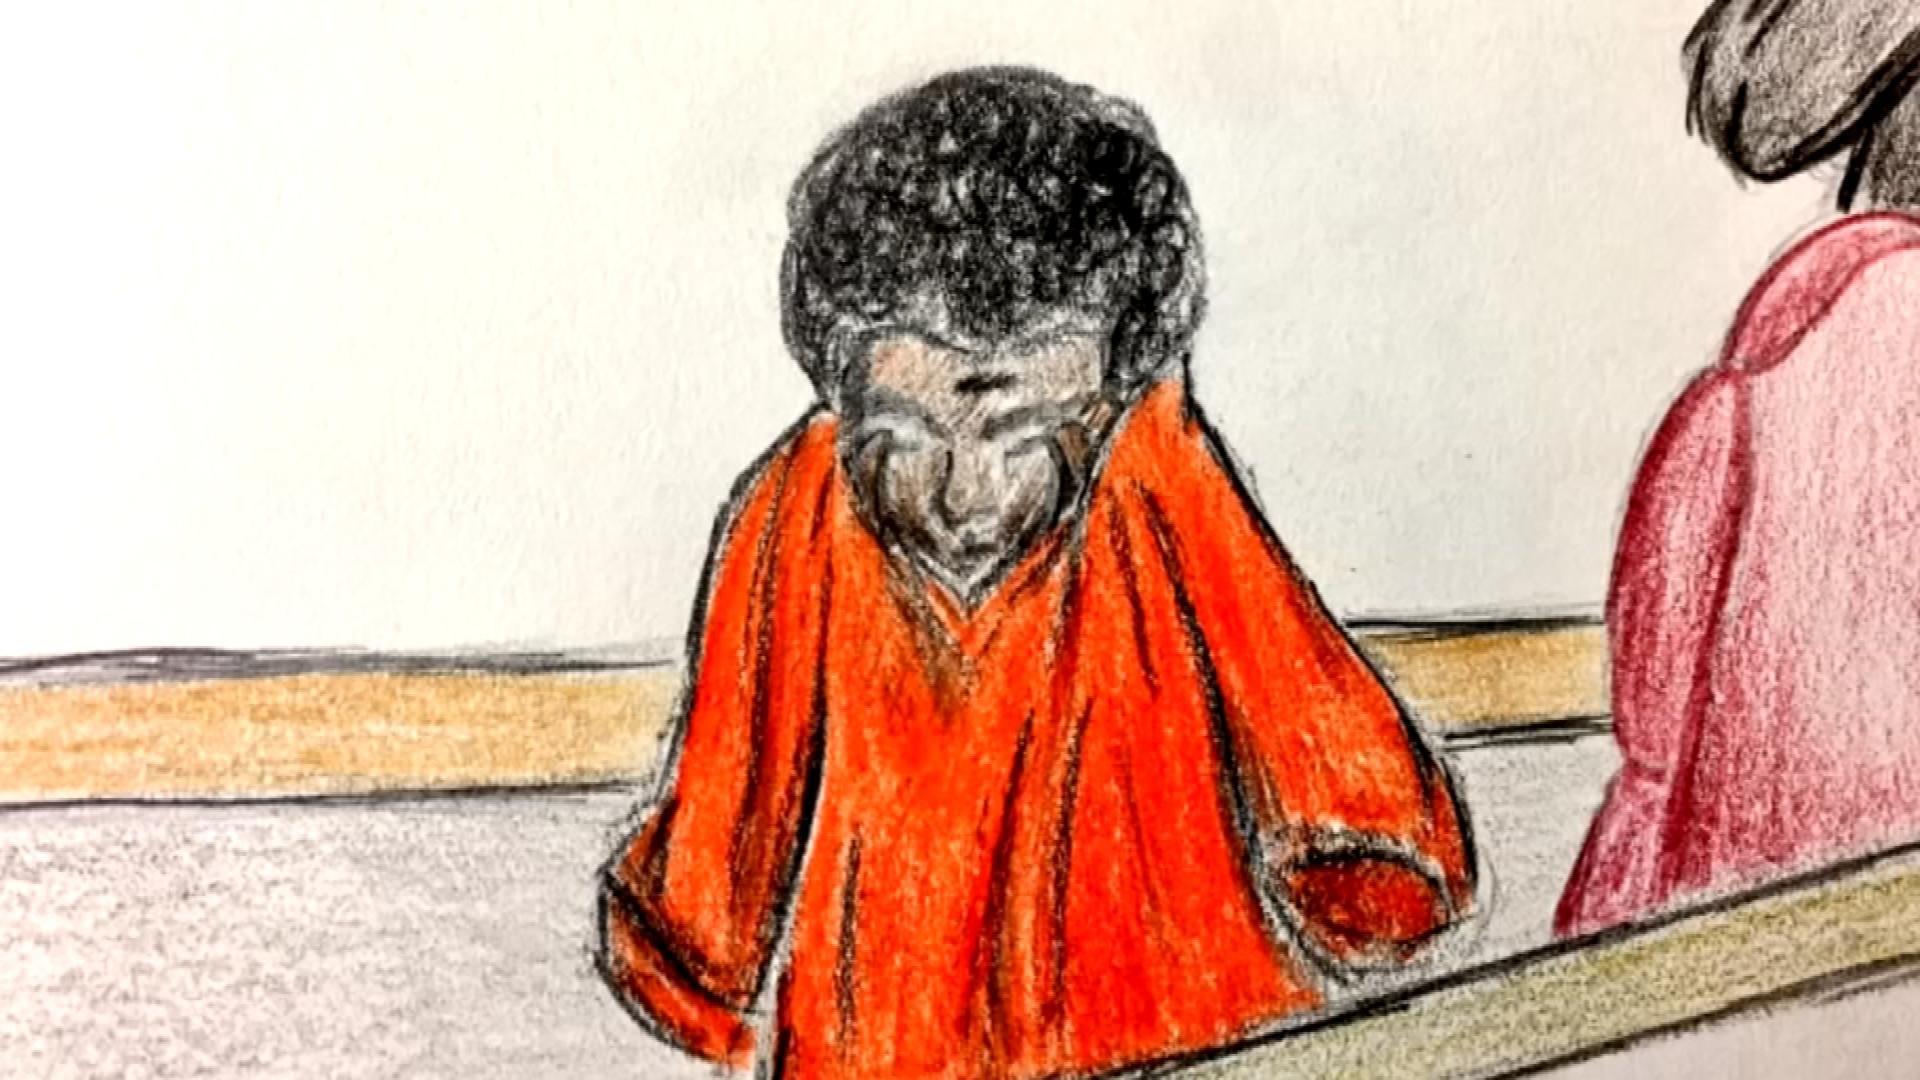 Punishment Phase To Begin Monday In Alton Nolen Trial